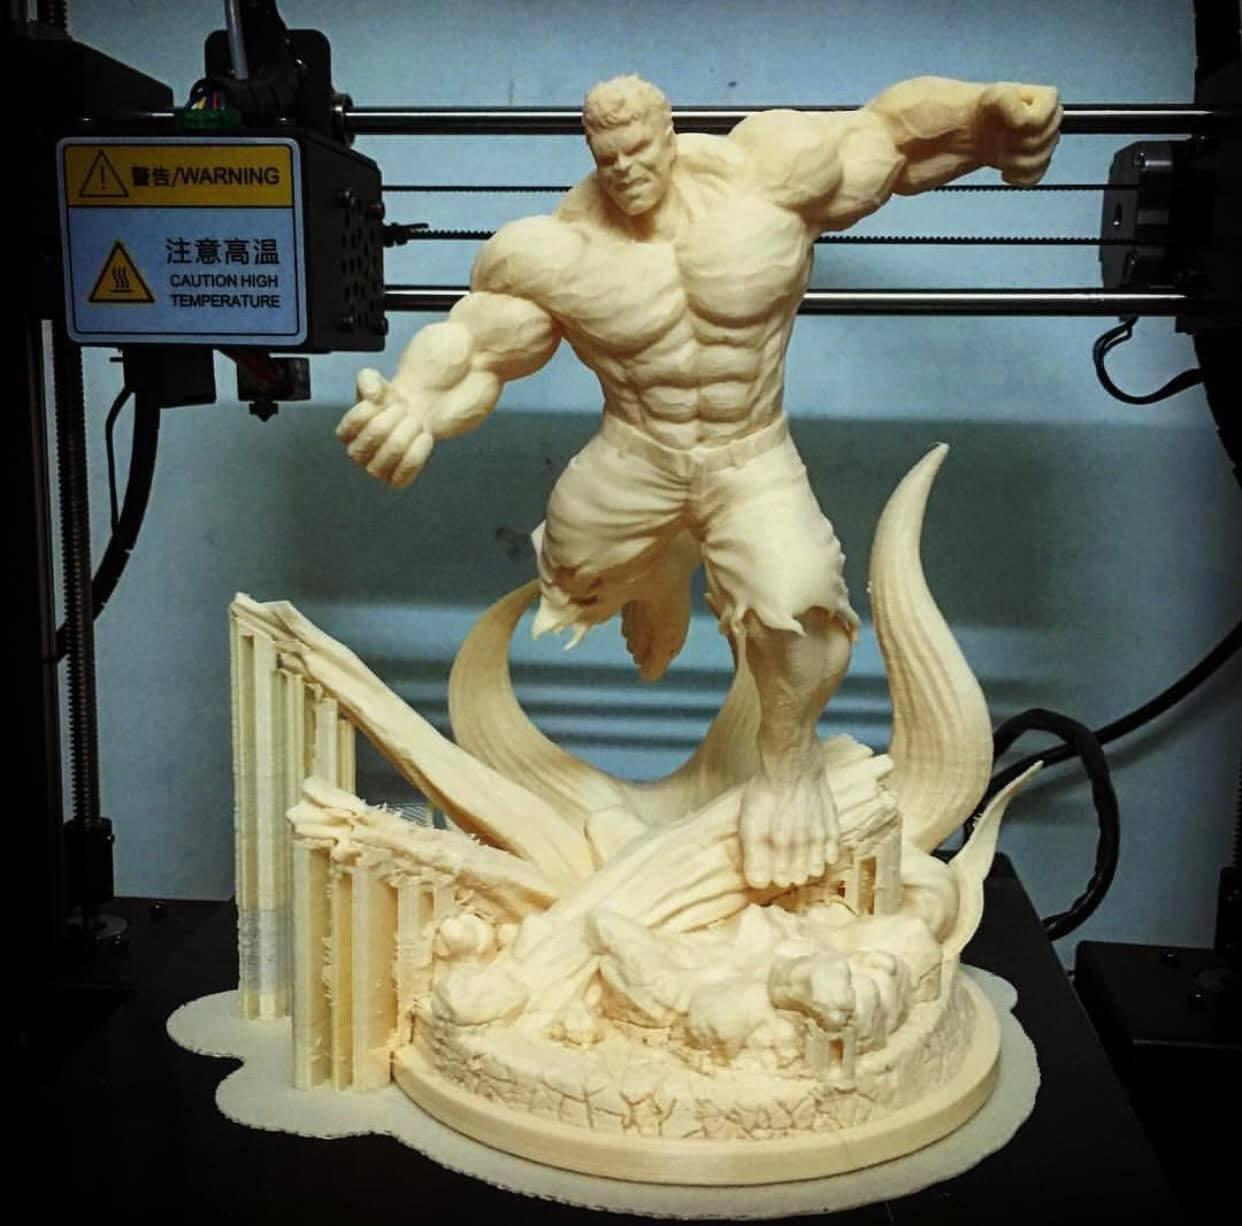 49487644_10218342046081590_6862690043392163840_o.jpg Download STL file Hulk Angry - Super Hero - Marvel 3D print model • 3D print model, Bstar3Dart